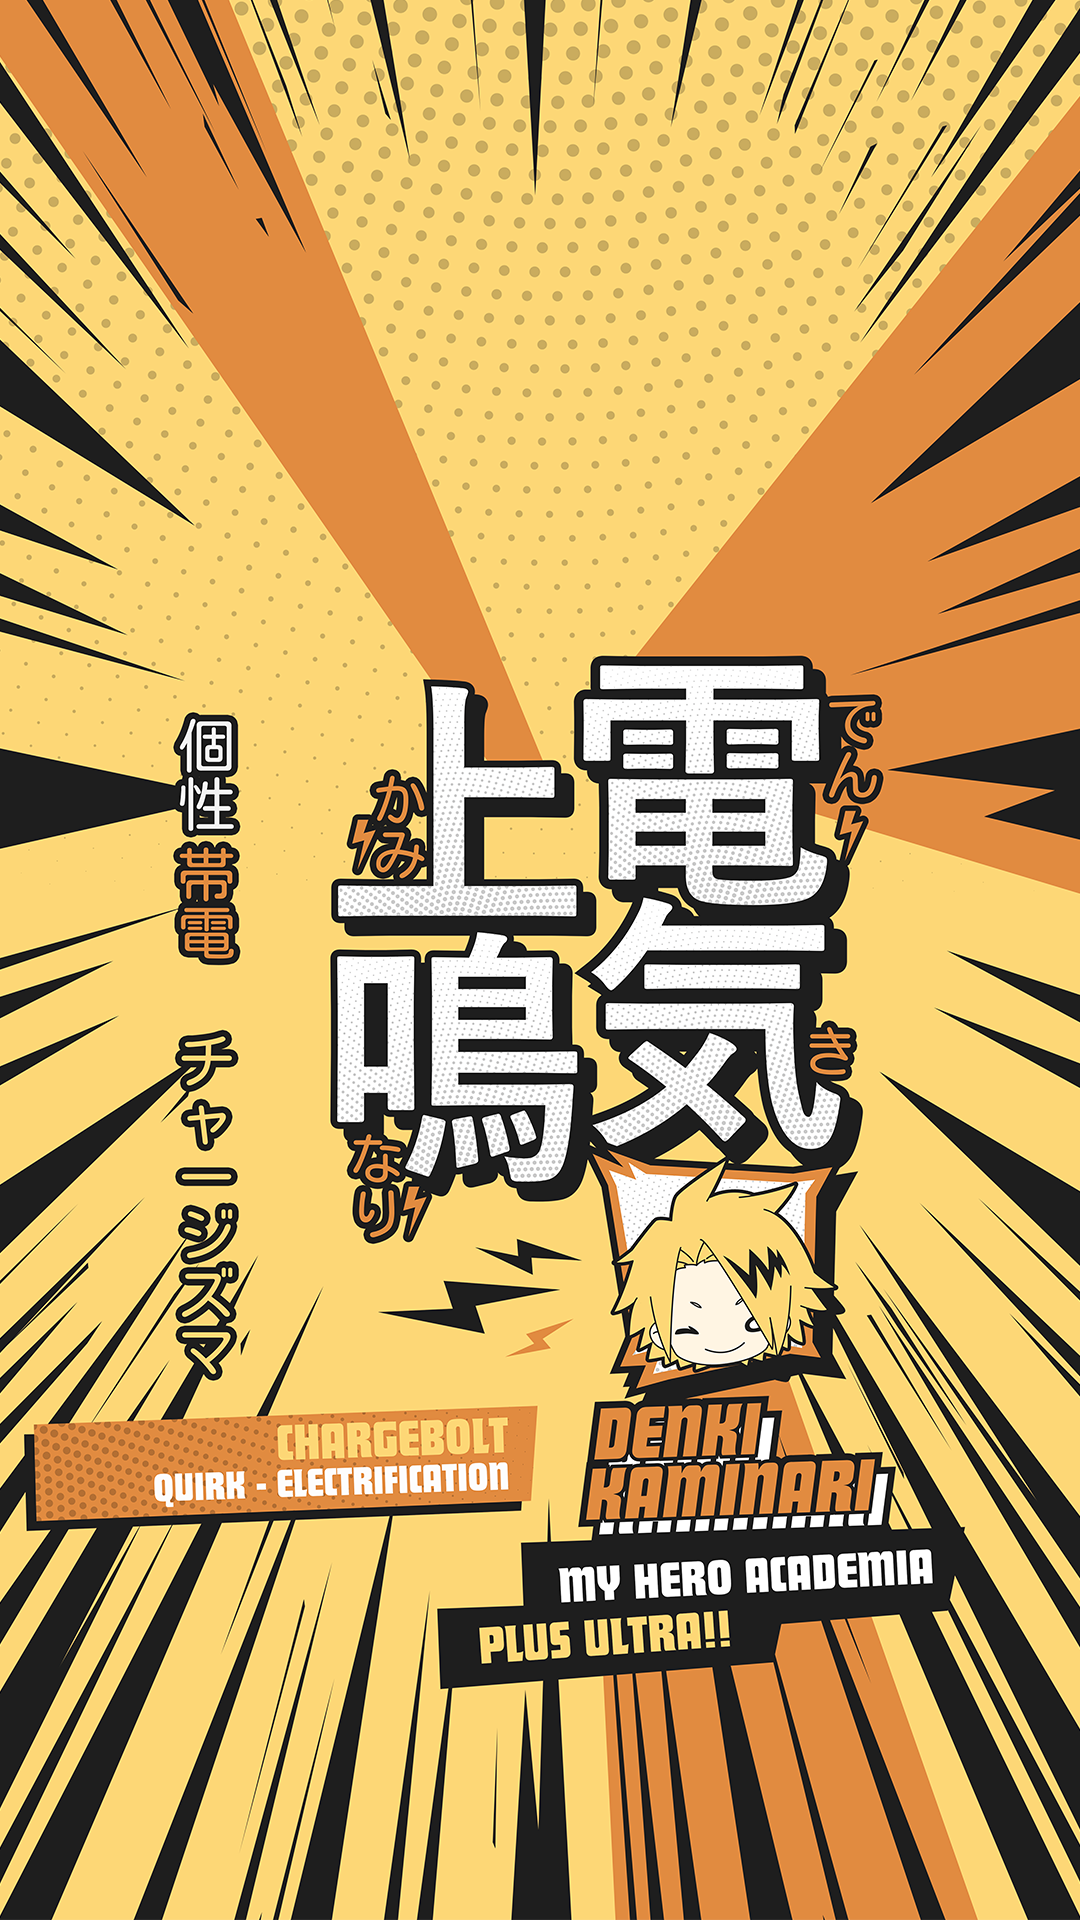 Chargebolt Wallpaper - Kaminari Denki Wallpaper - My Hero Academia